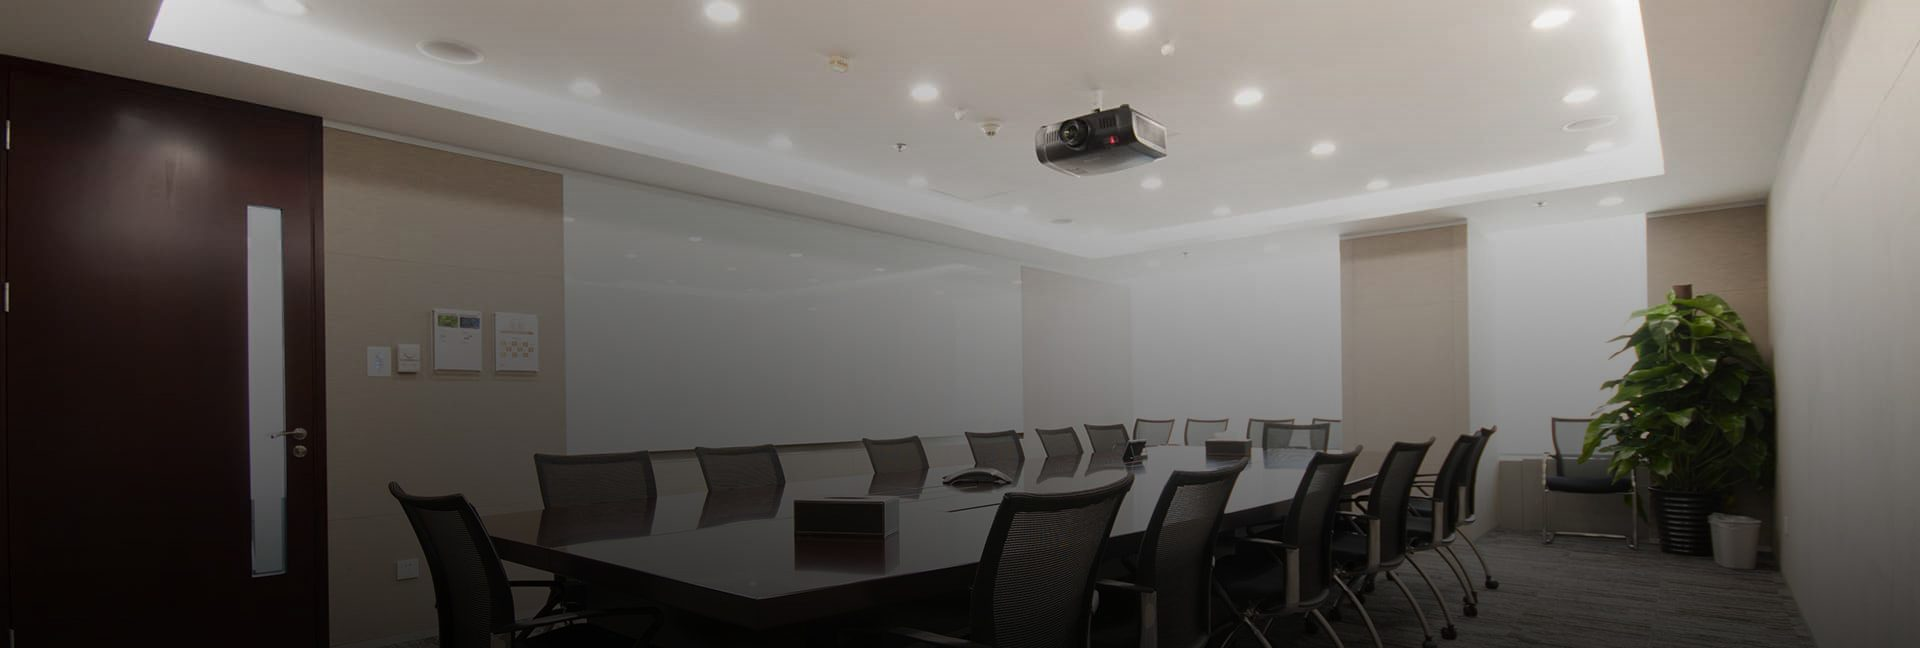 l box false ceiling